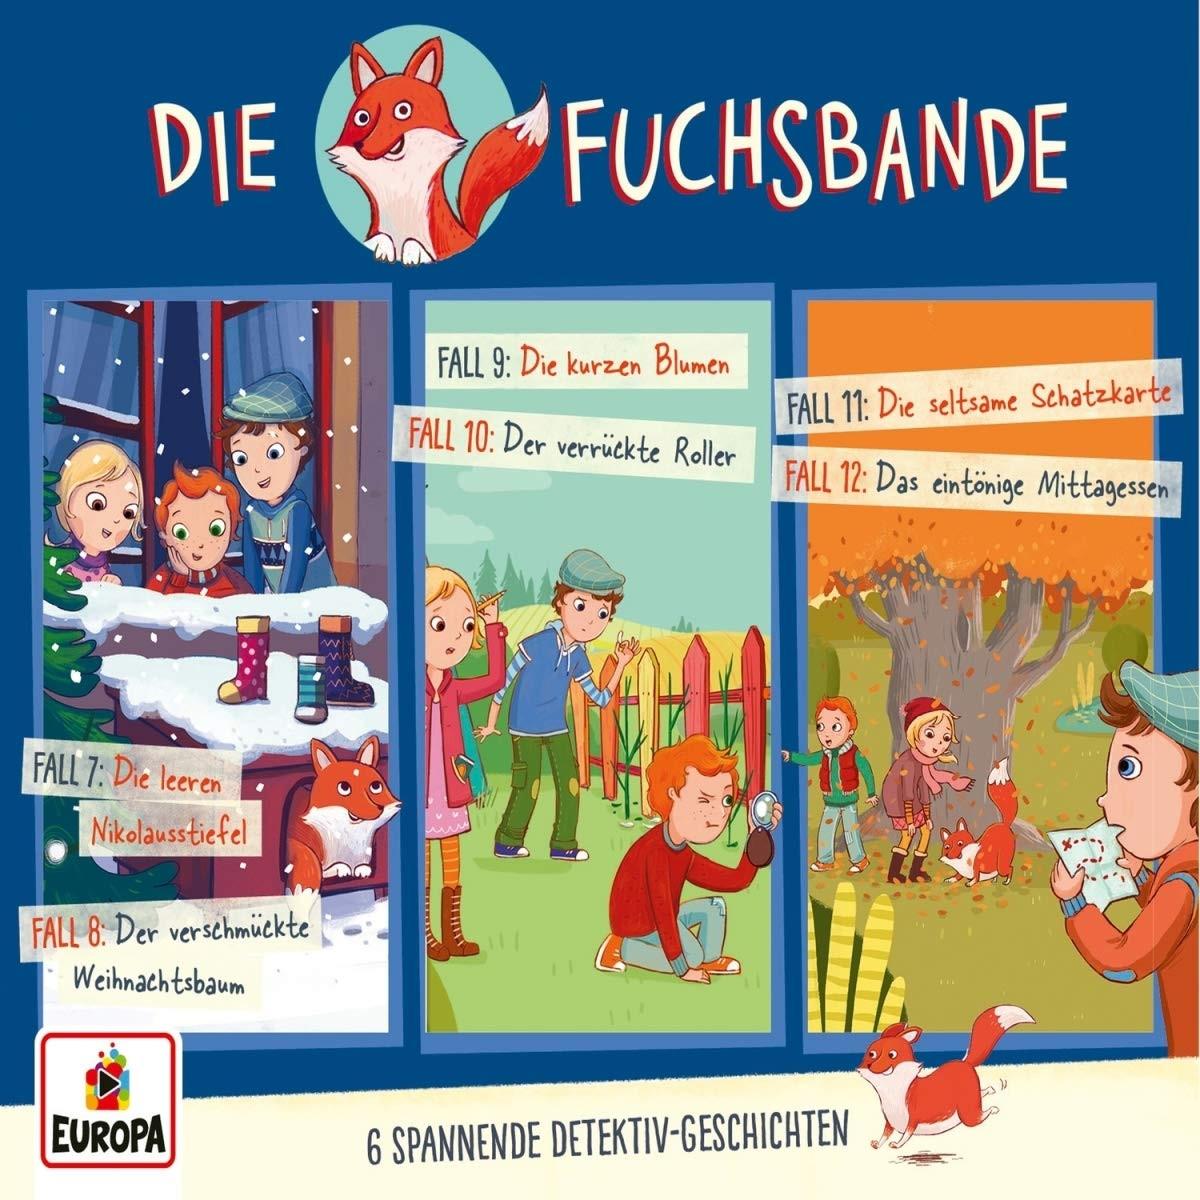 Die Fuchsbande 3er Detektiv-Box (Folge 4, 5, 6)